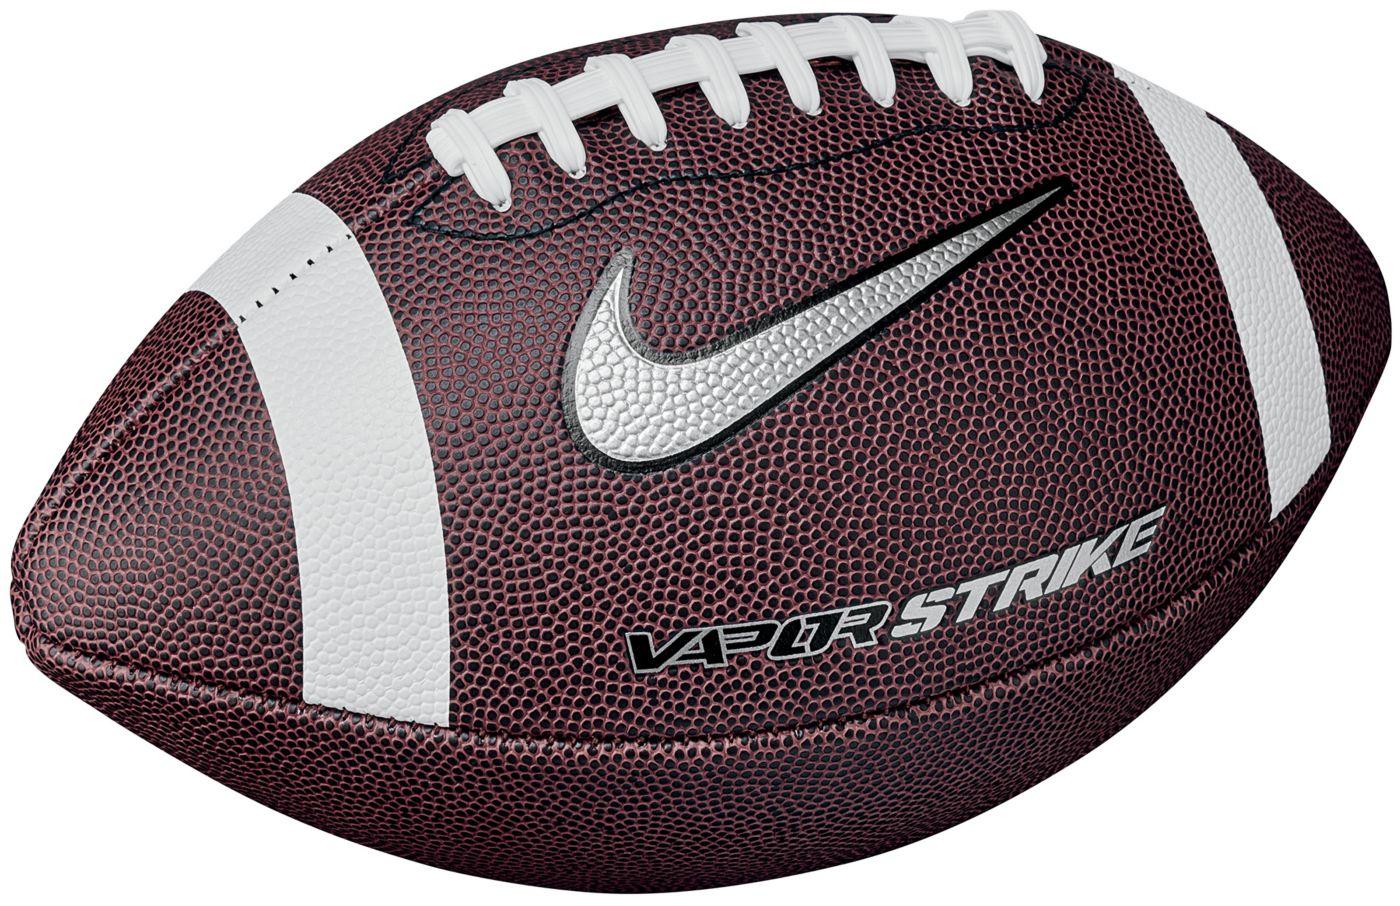 Nike Vapor Strike 2.0 Football